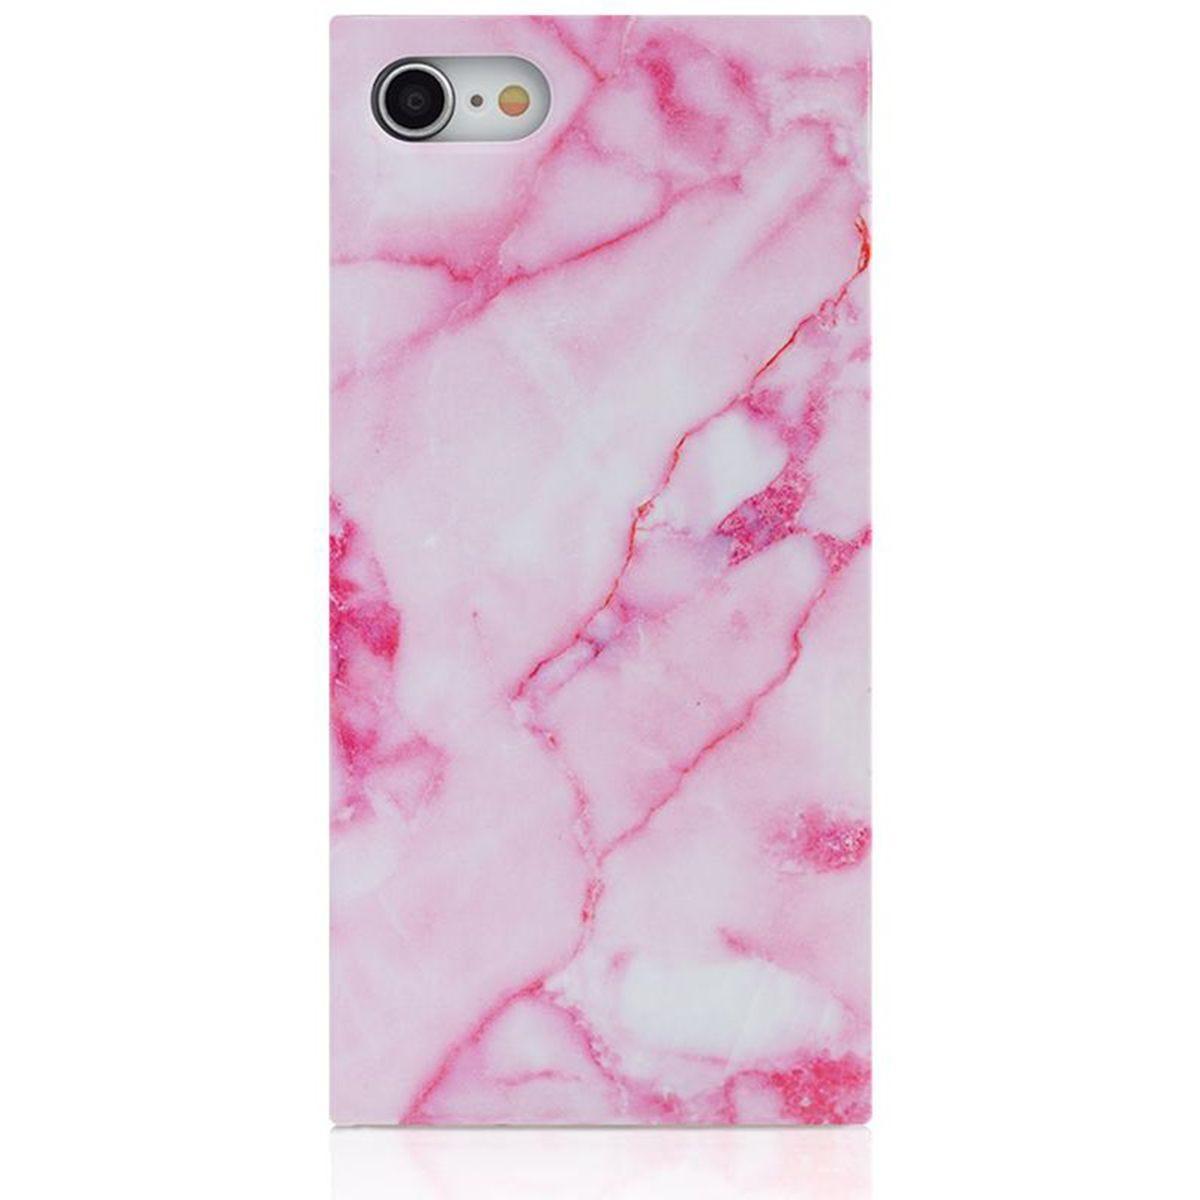 iDecoz Blush Marble Phone Case iPhone X/XS